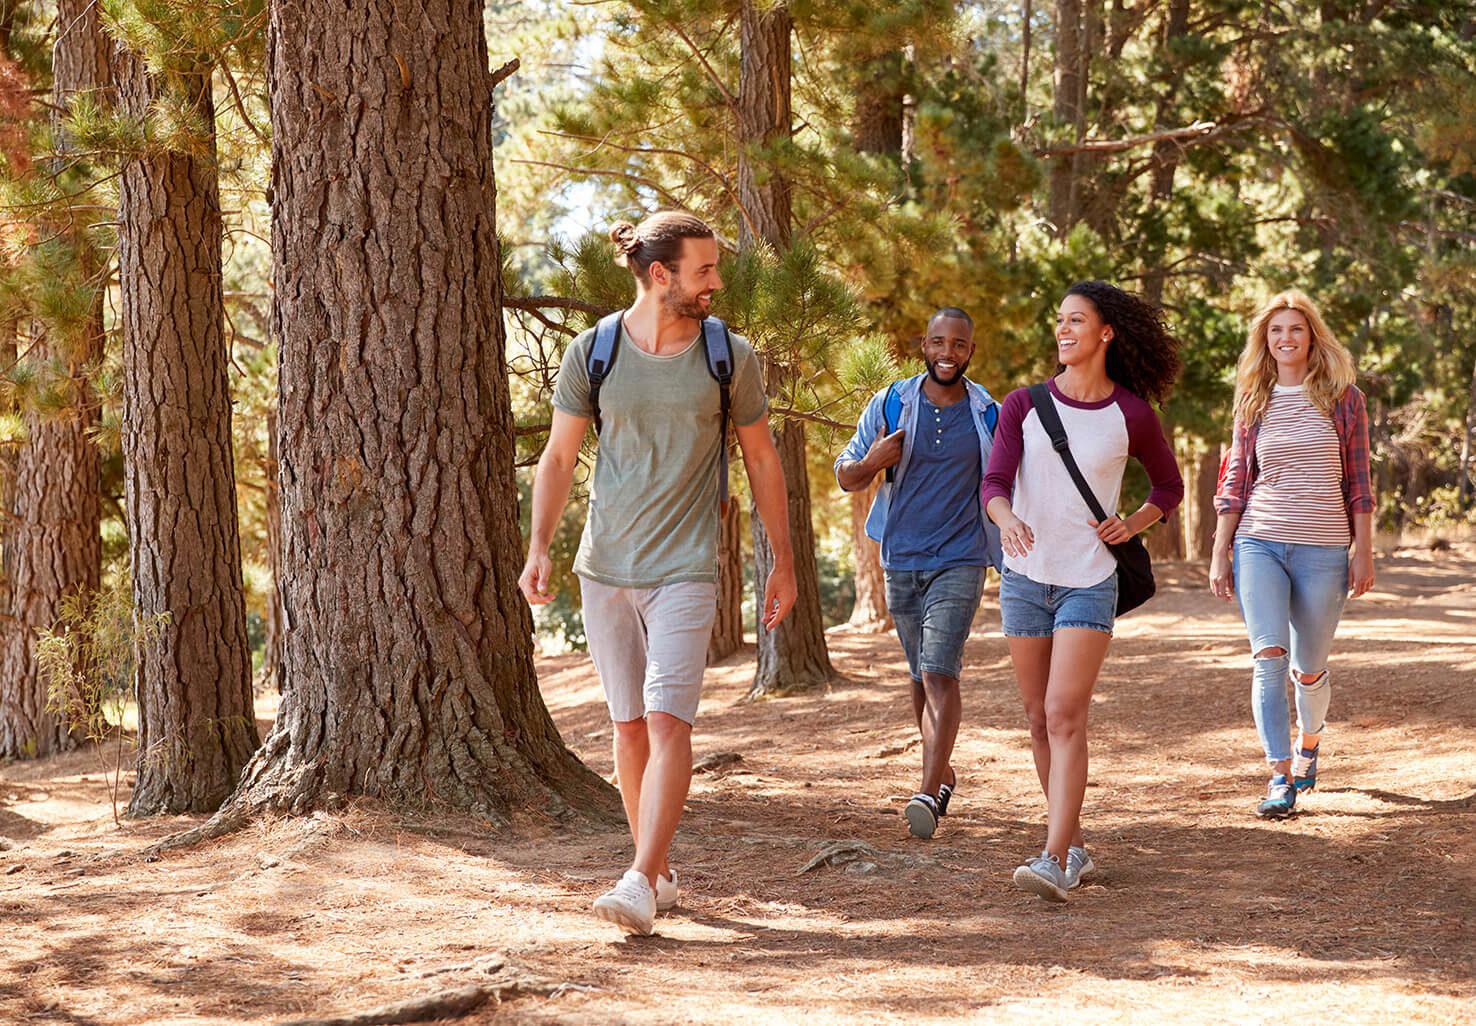 Group hiking on Virginia couples getaway